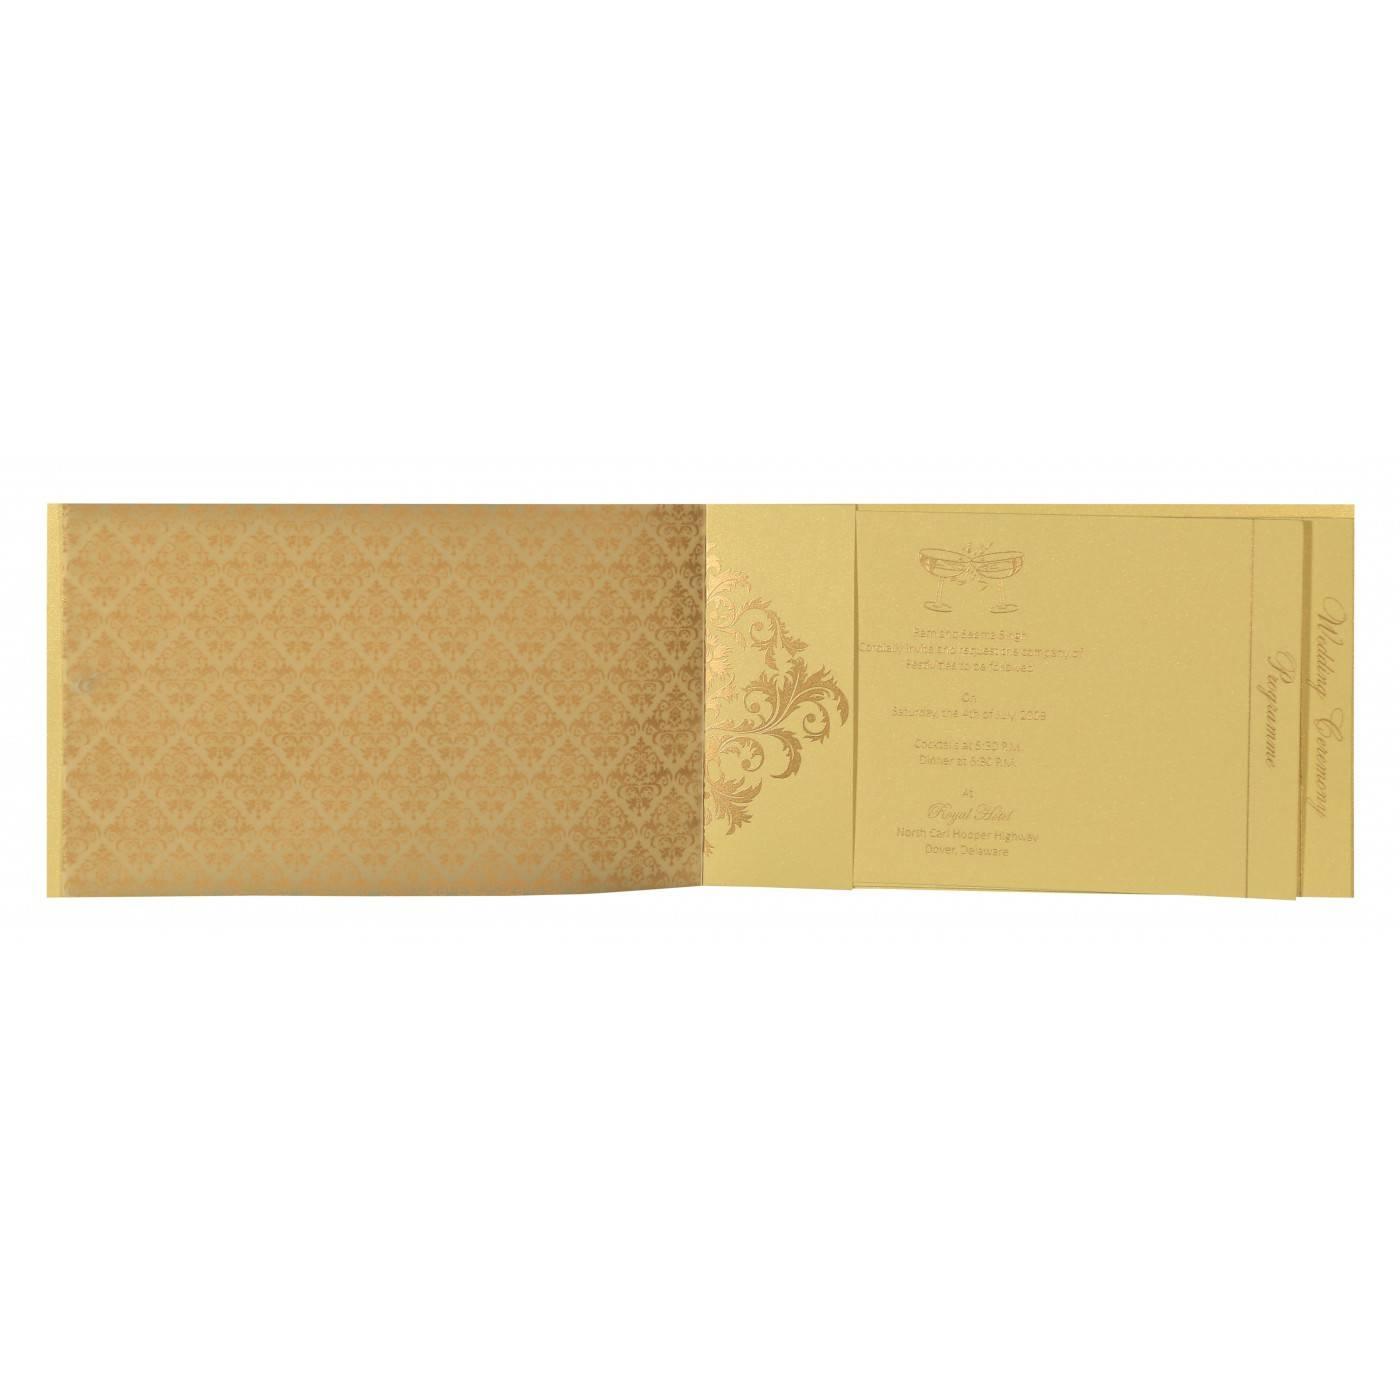 KHAKI SHIMMERY DAMASK THEMED - SCREEN PRINTED WEDDING CARD : CG-8257B - IndianWeddingCards